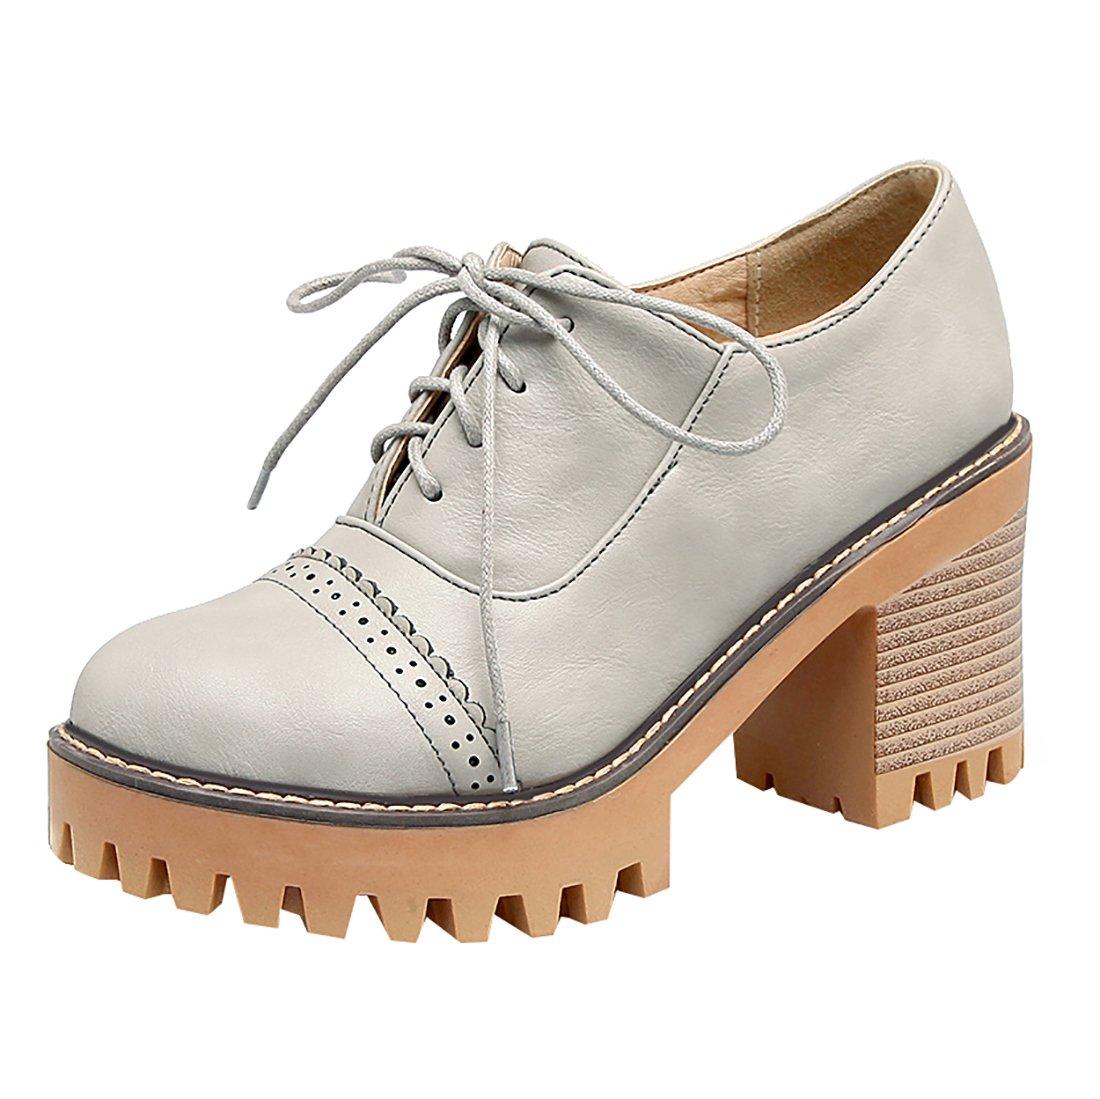 UH Damen Bequeme Chunky High Heels Plateau Schnuuml;r Pumps mit Blockabsatz 8cm Absatz Freizeit Schuhe35 EU|Grau